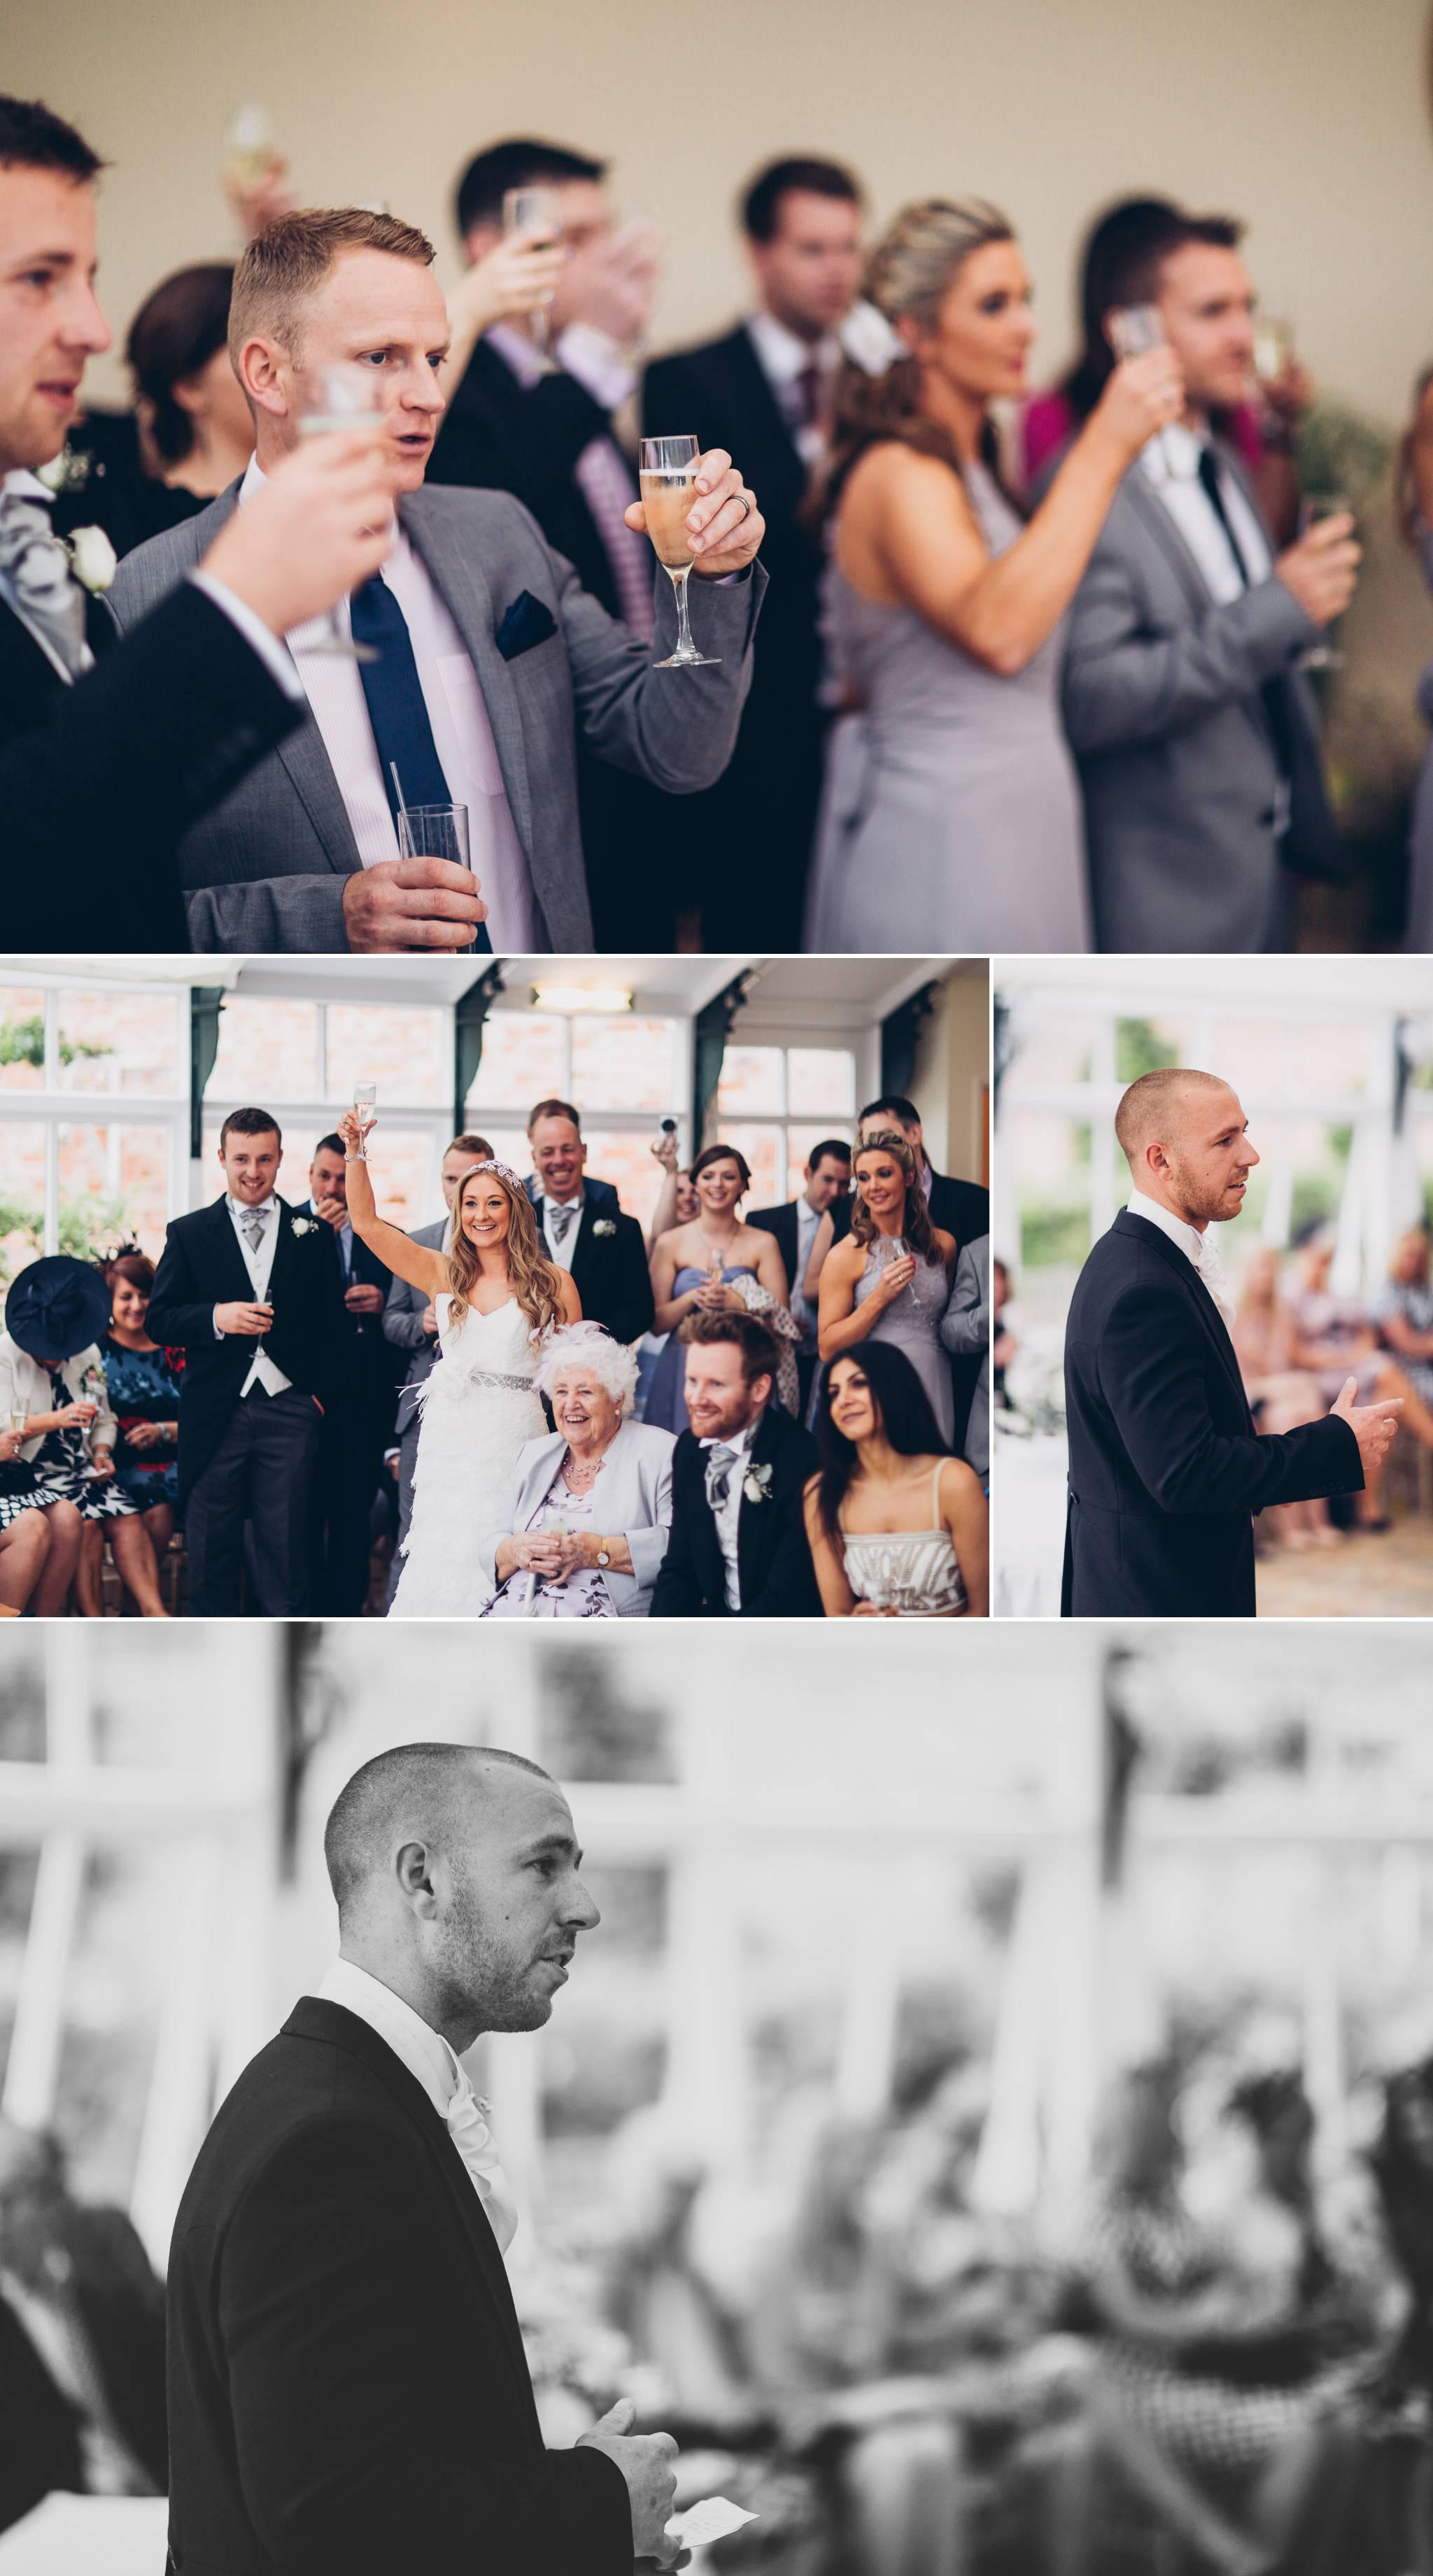 shropshire-wedding-photography 24.jpg